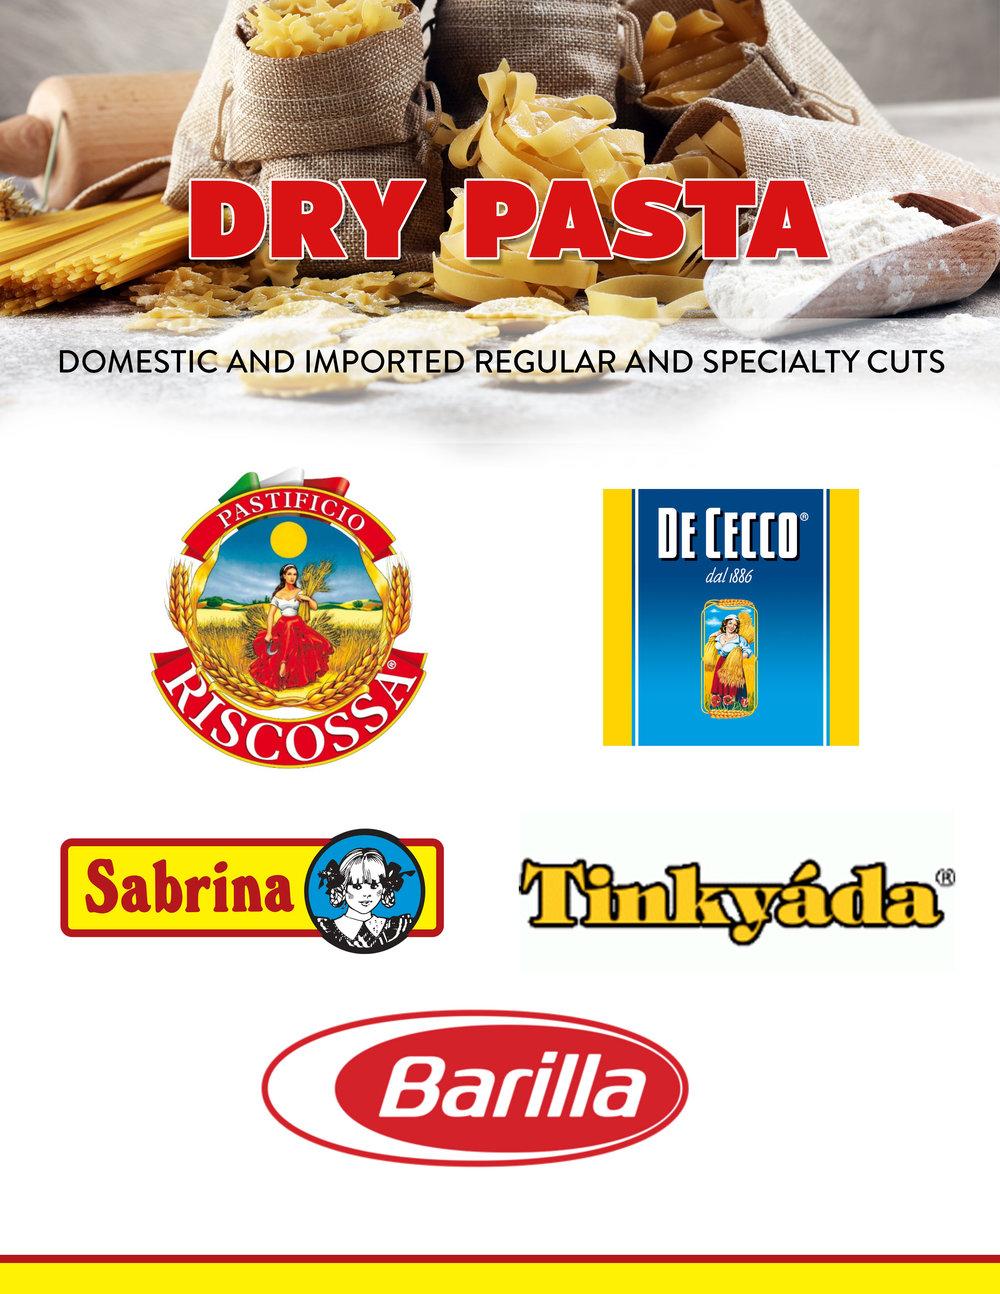 Dry-pasta-sell-sheet.jpg